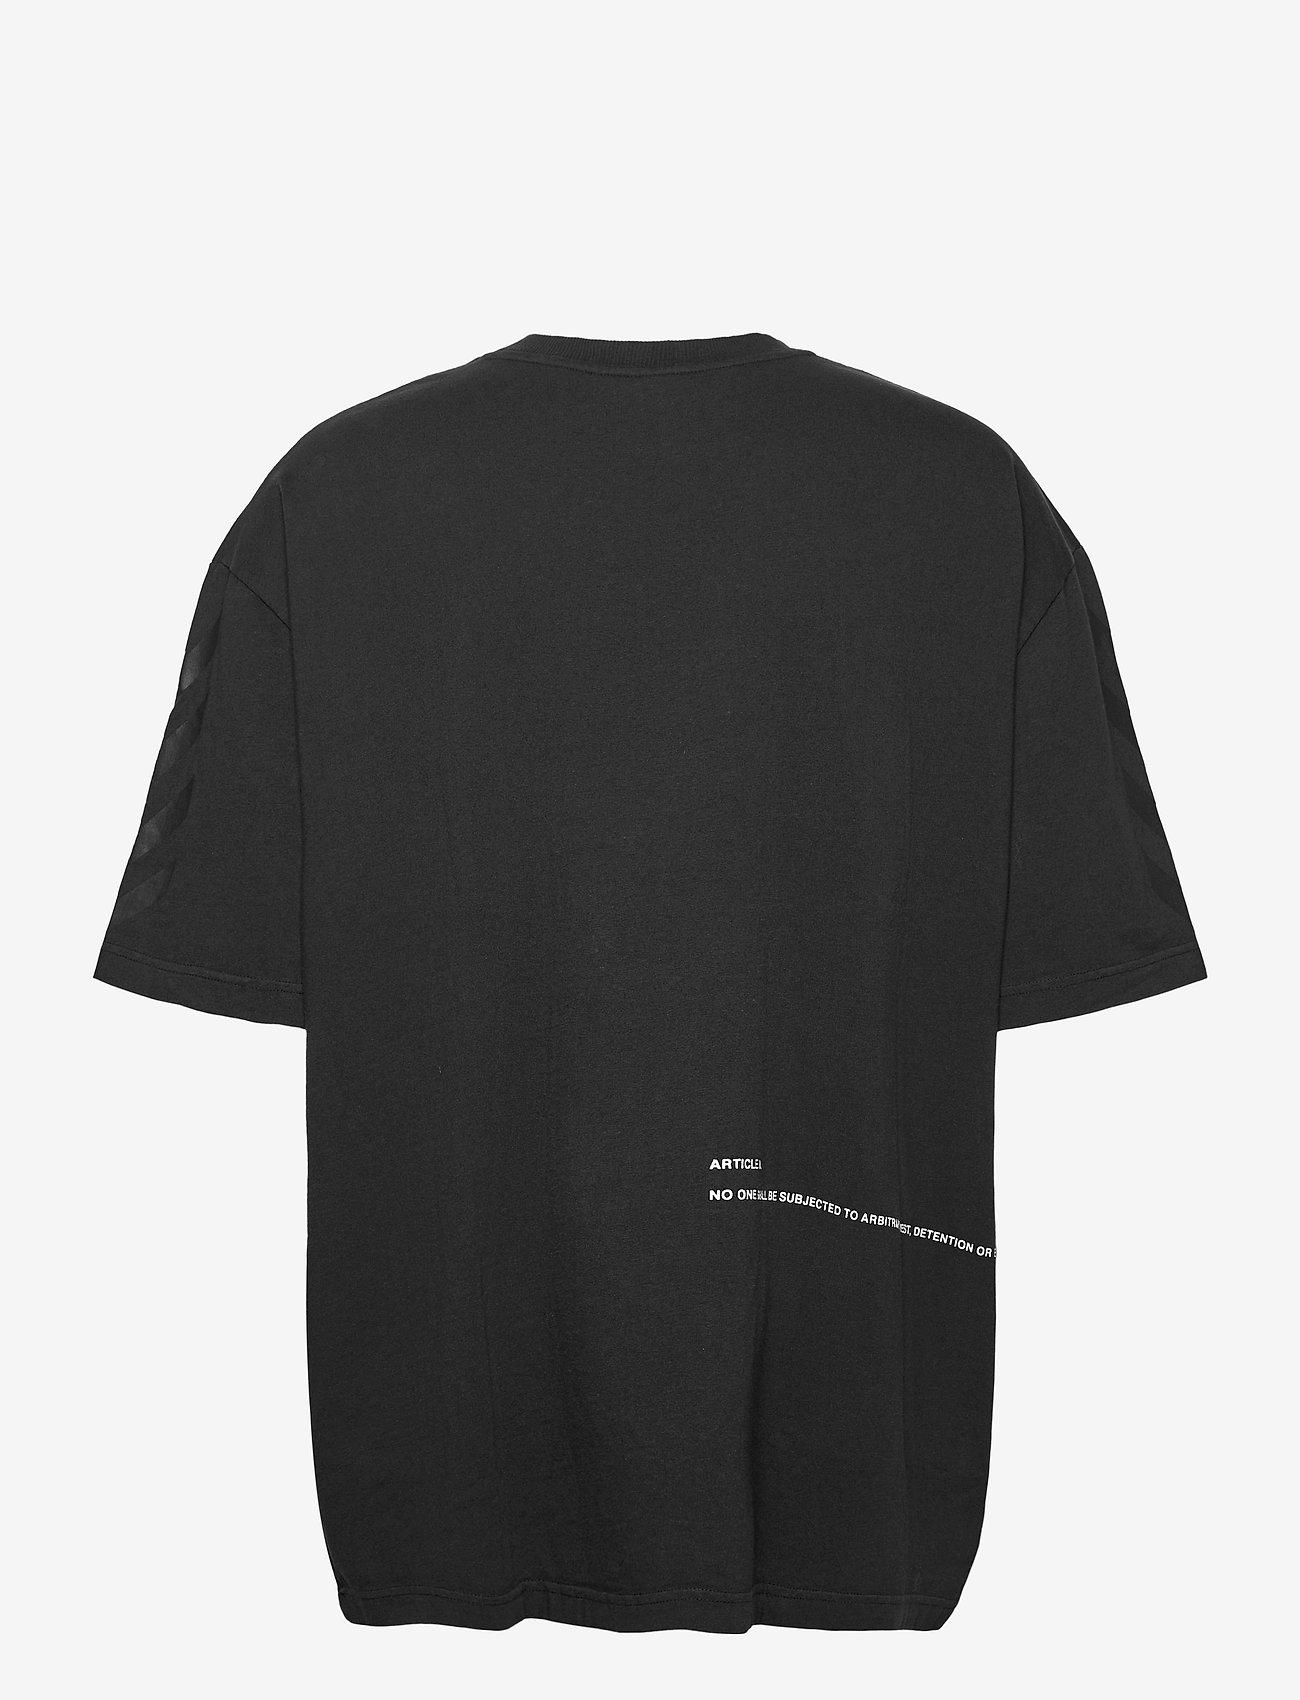 Hummel - hmlWILLY BUFFALO T-SHIRT S/S - t-shirts - black - 1